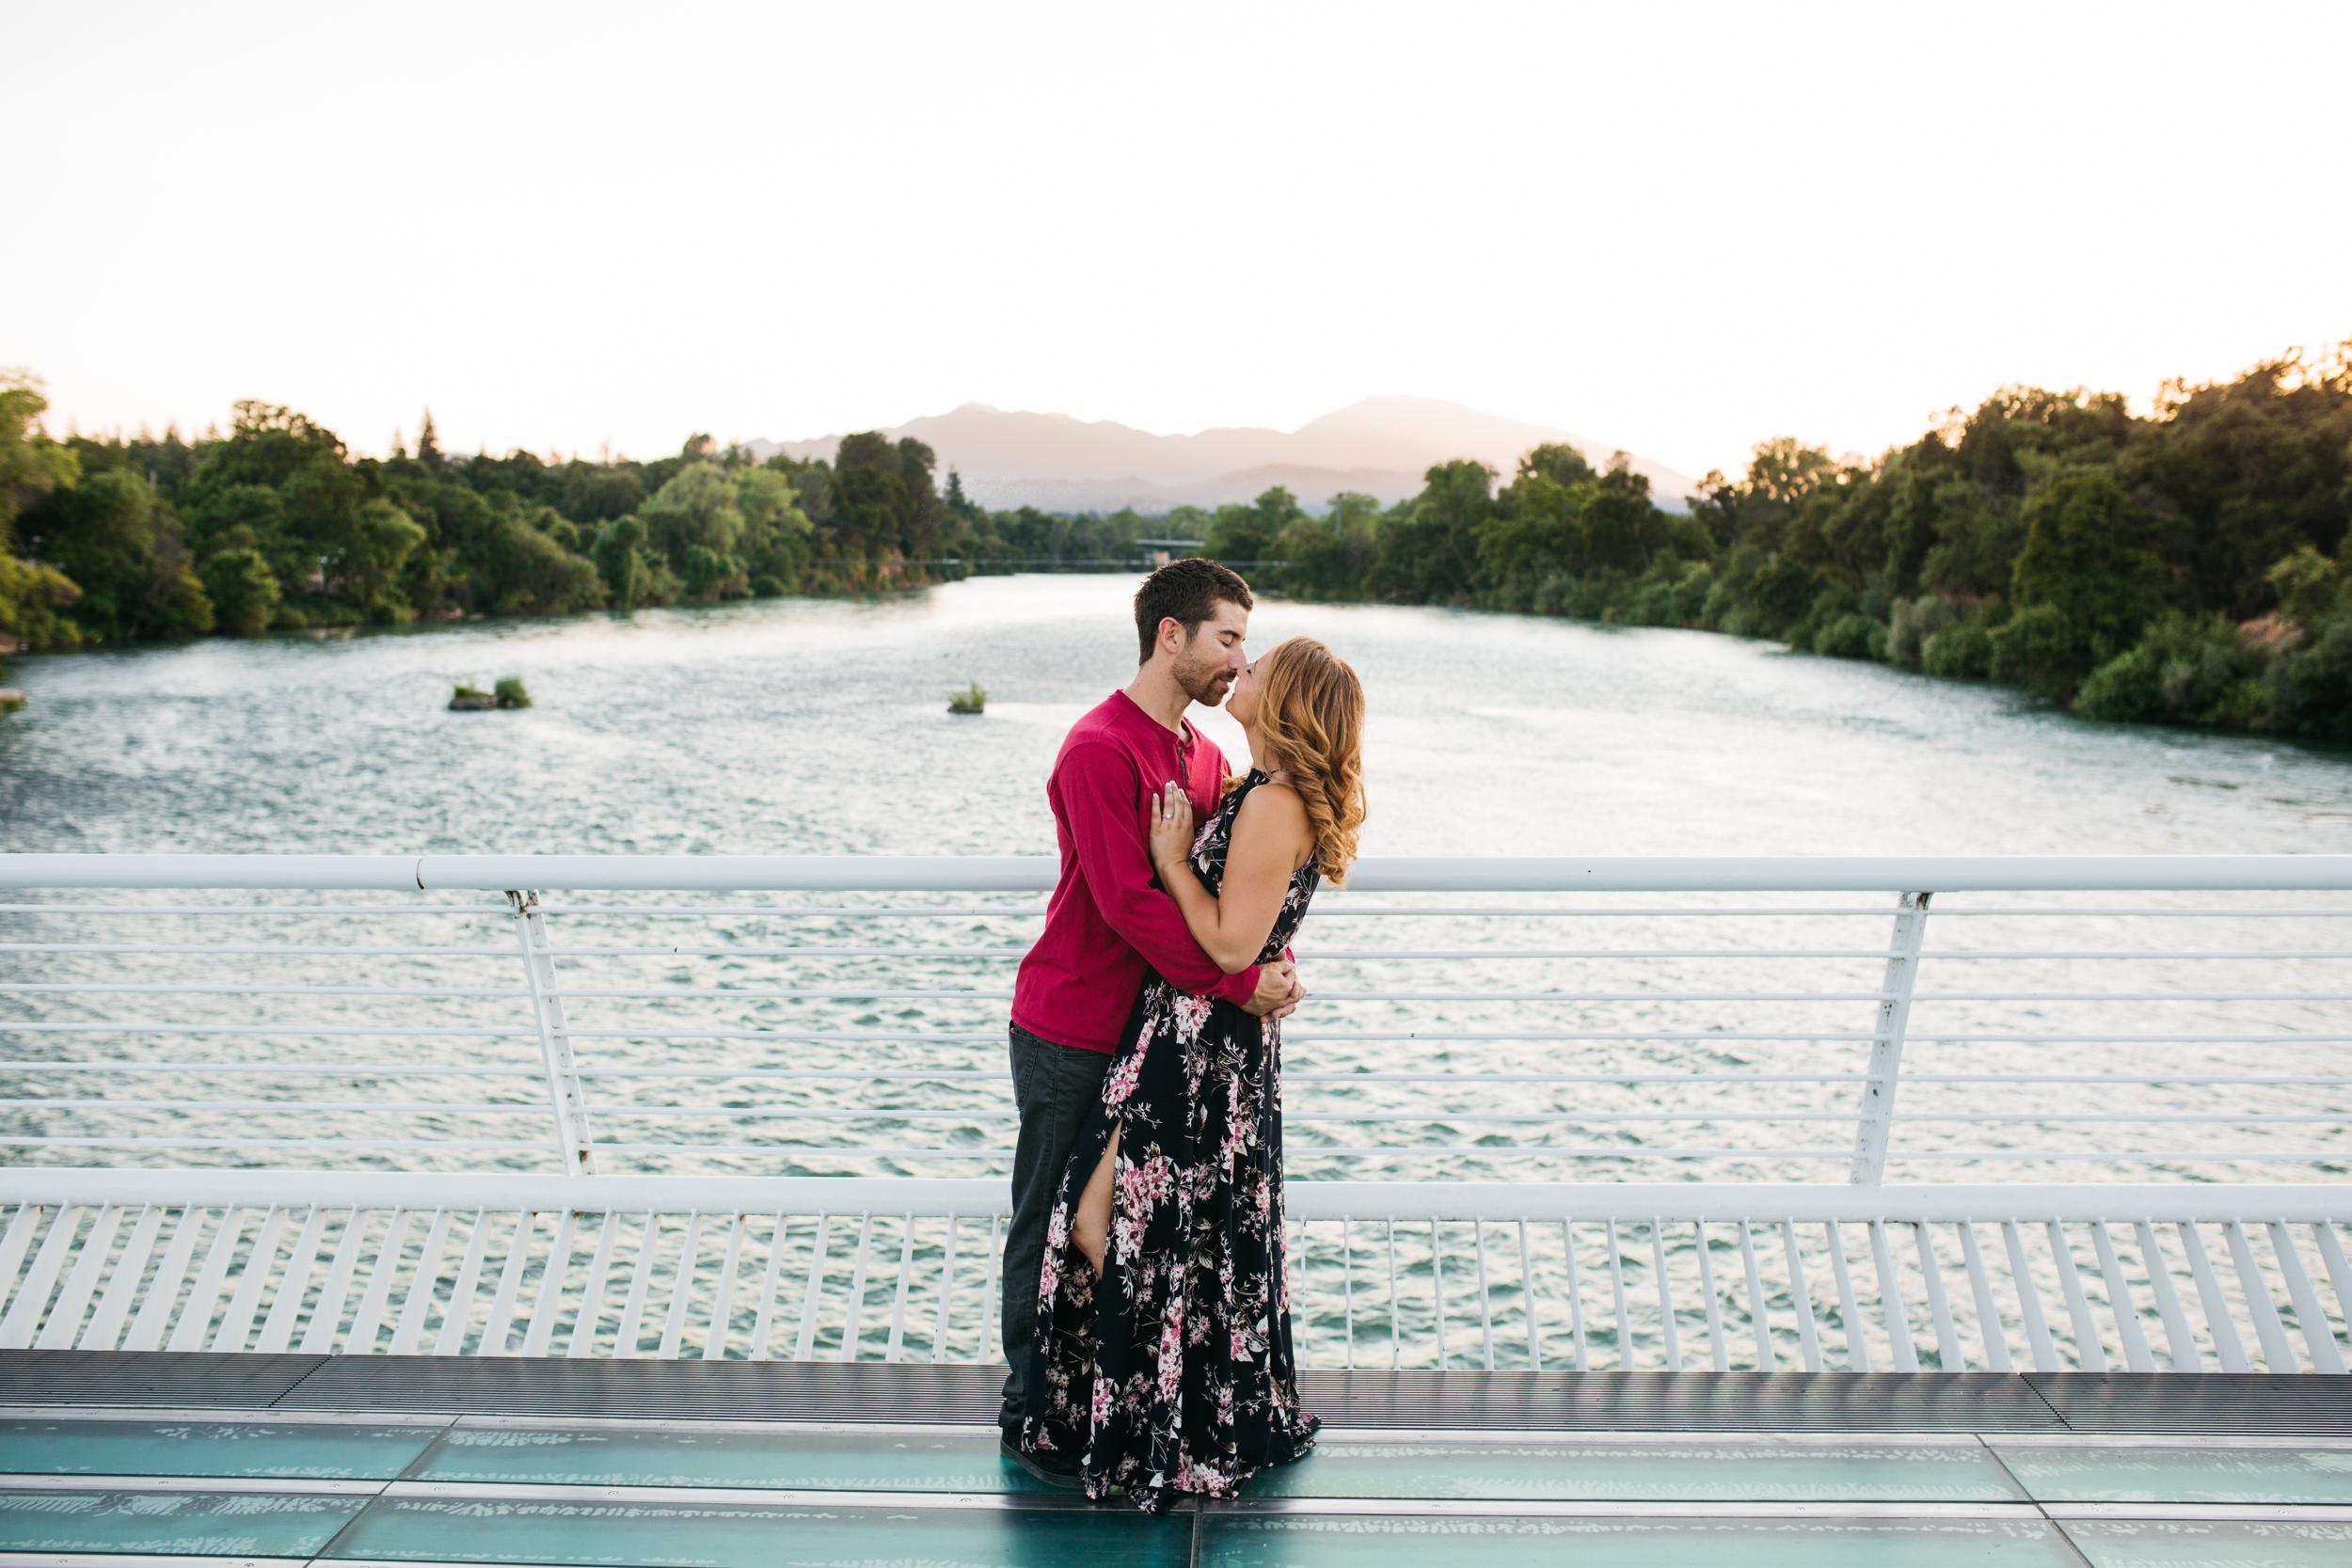 Engagement Photos-Redding-Turtle Bay-Sundial Bridge-Ranalla Photo & Films-Wedding Photography-38.jpg